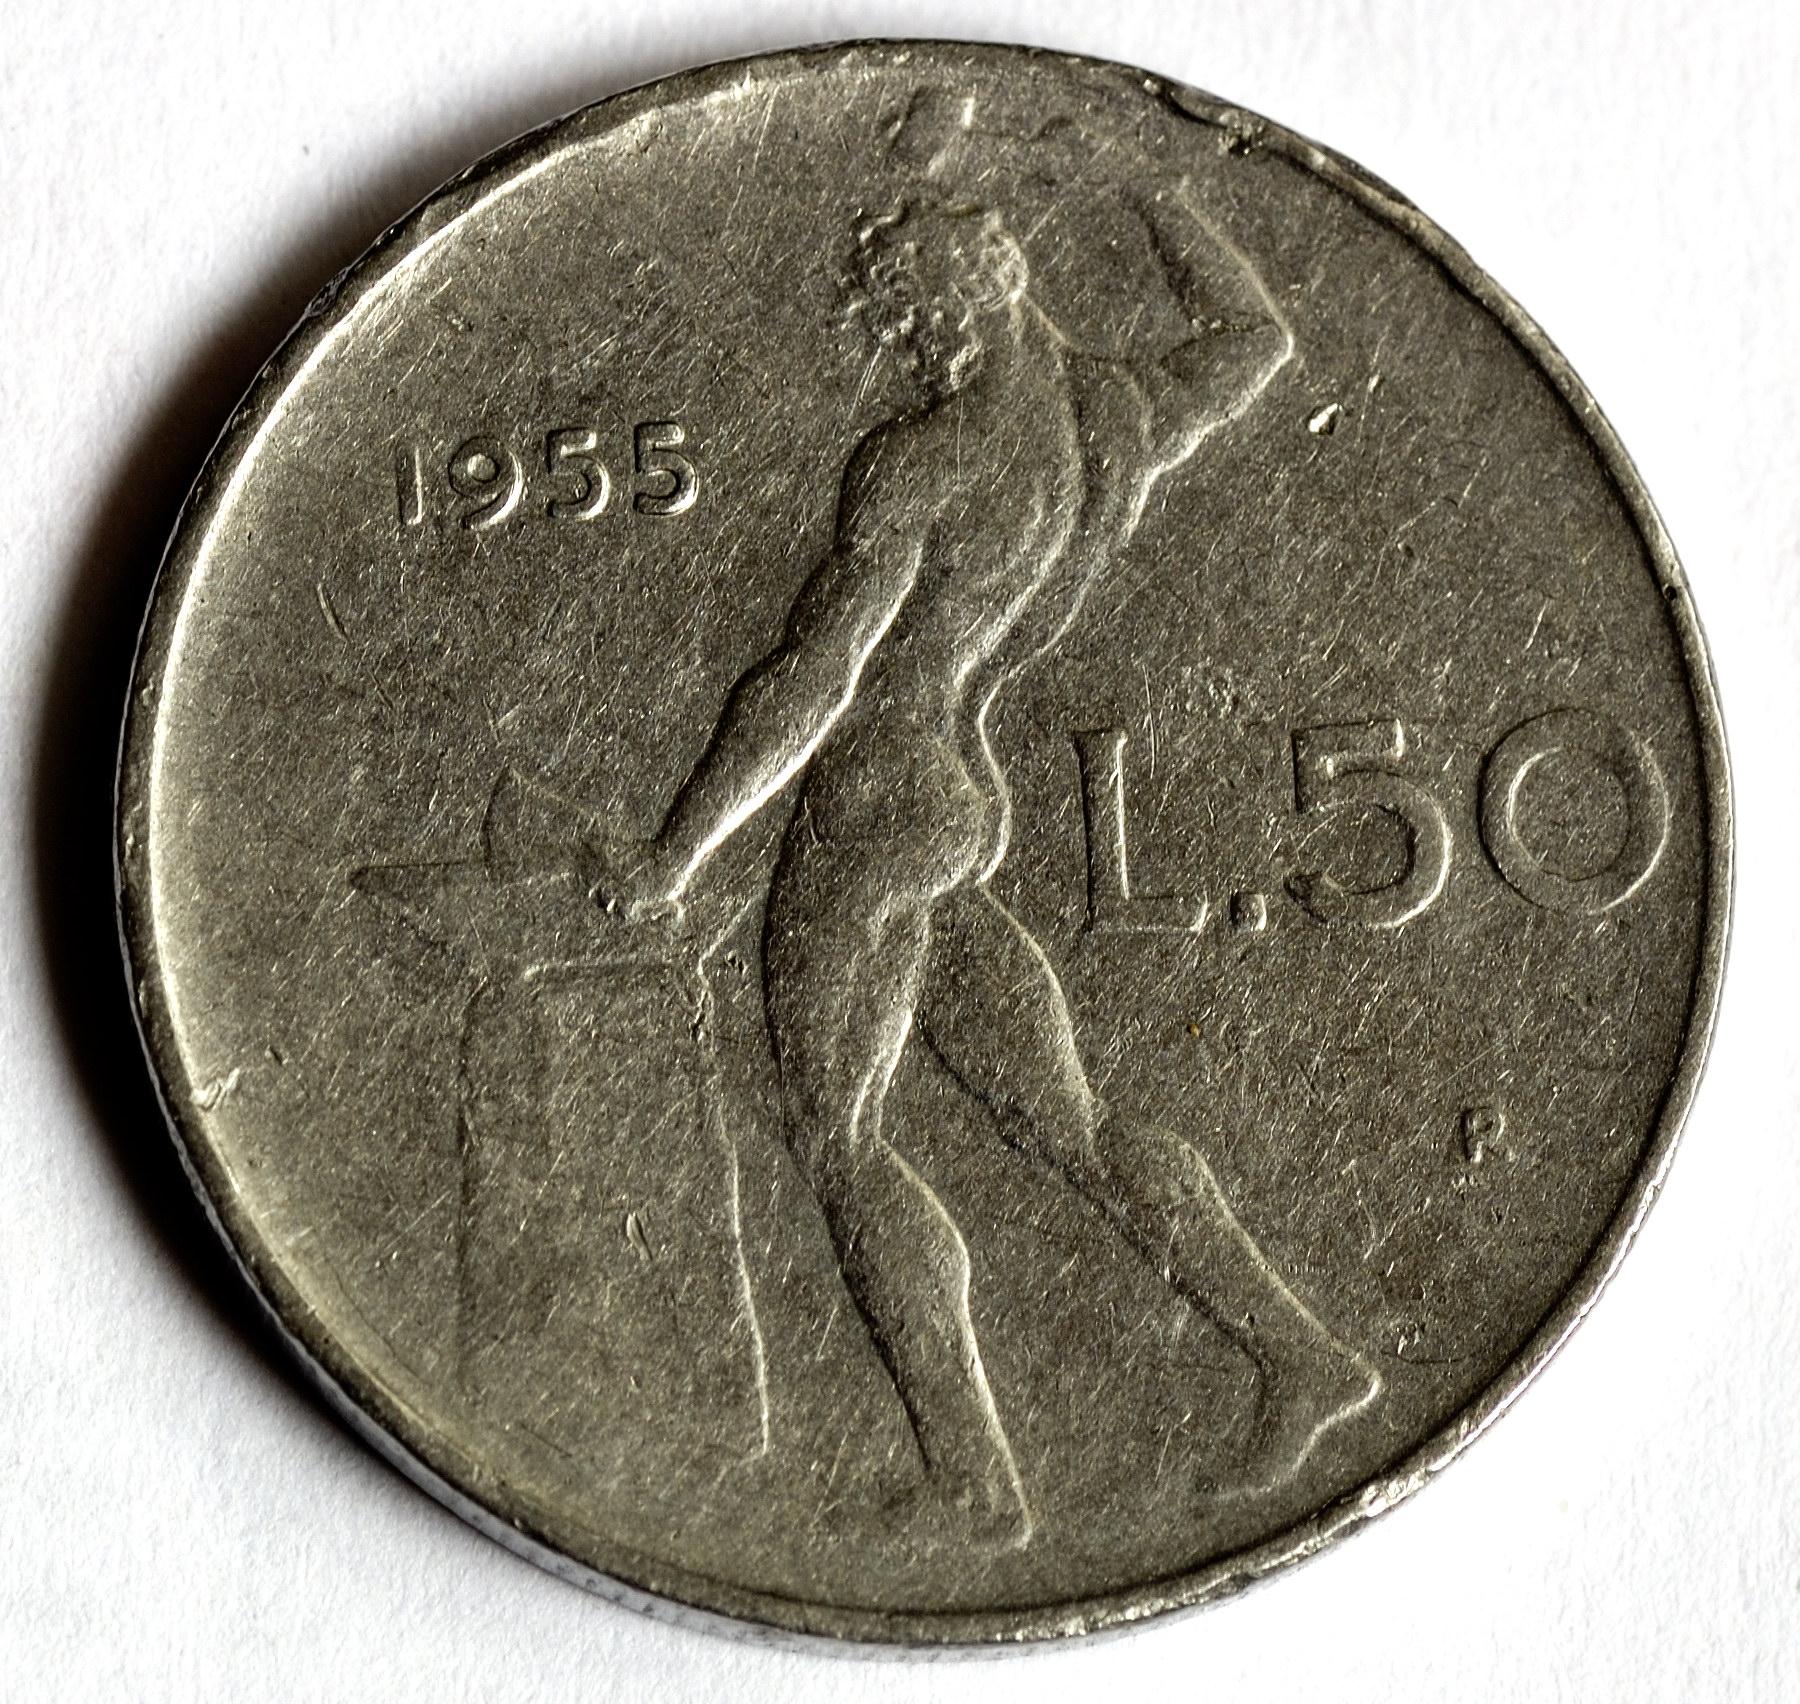 On The 50 Lire